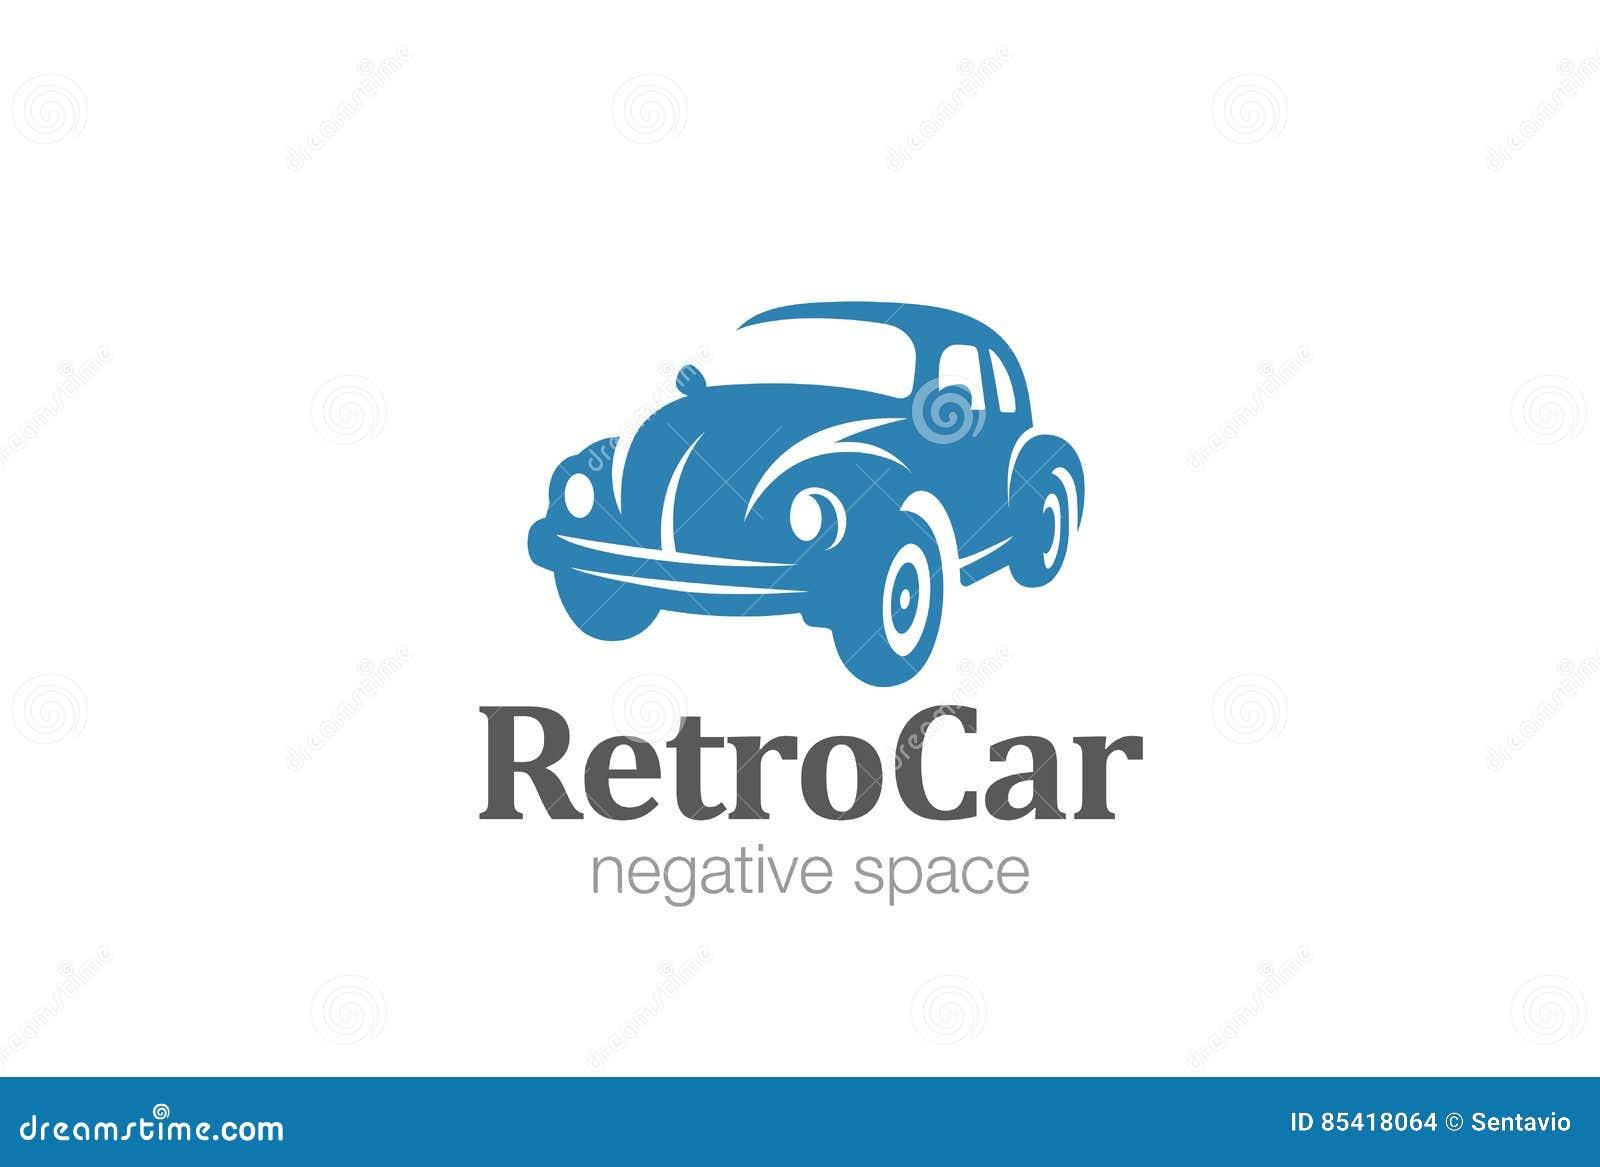 Vintage Car Logo Design Negative Space. Stock Vector - Image: 85418064